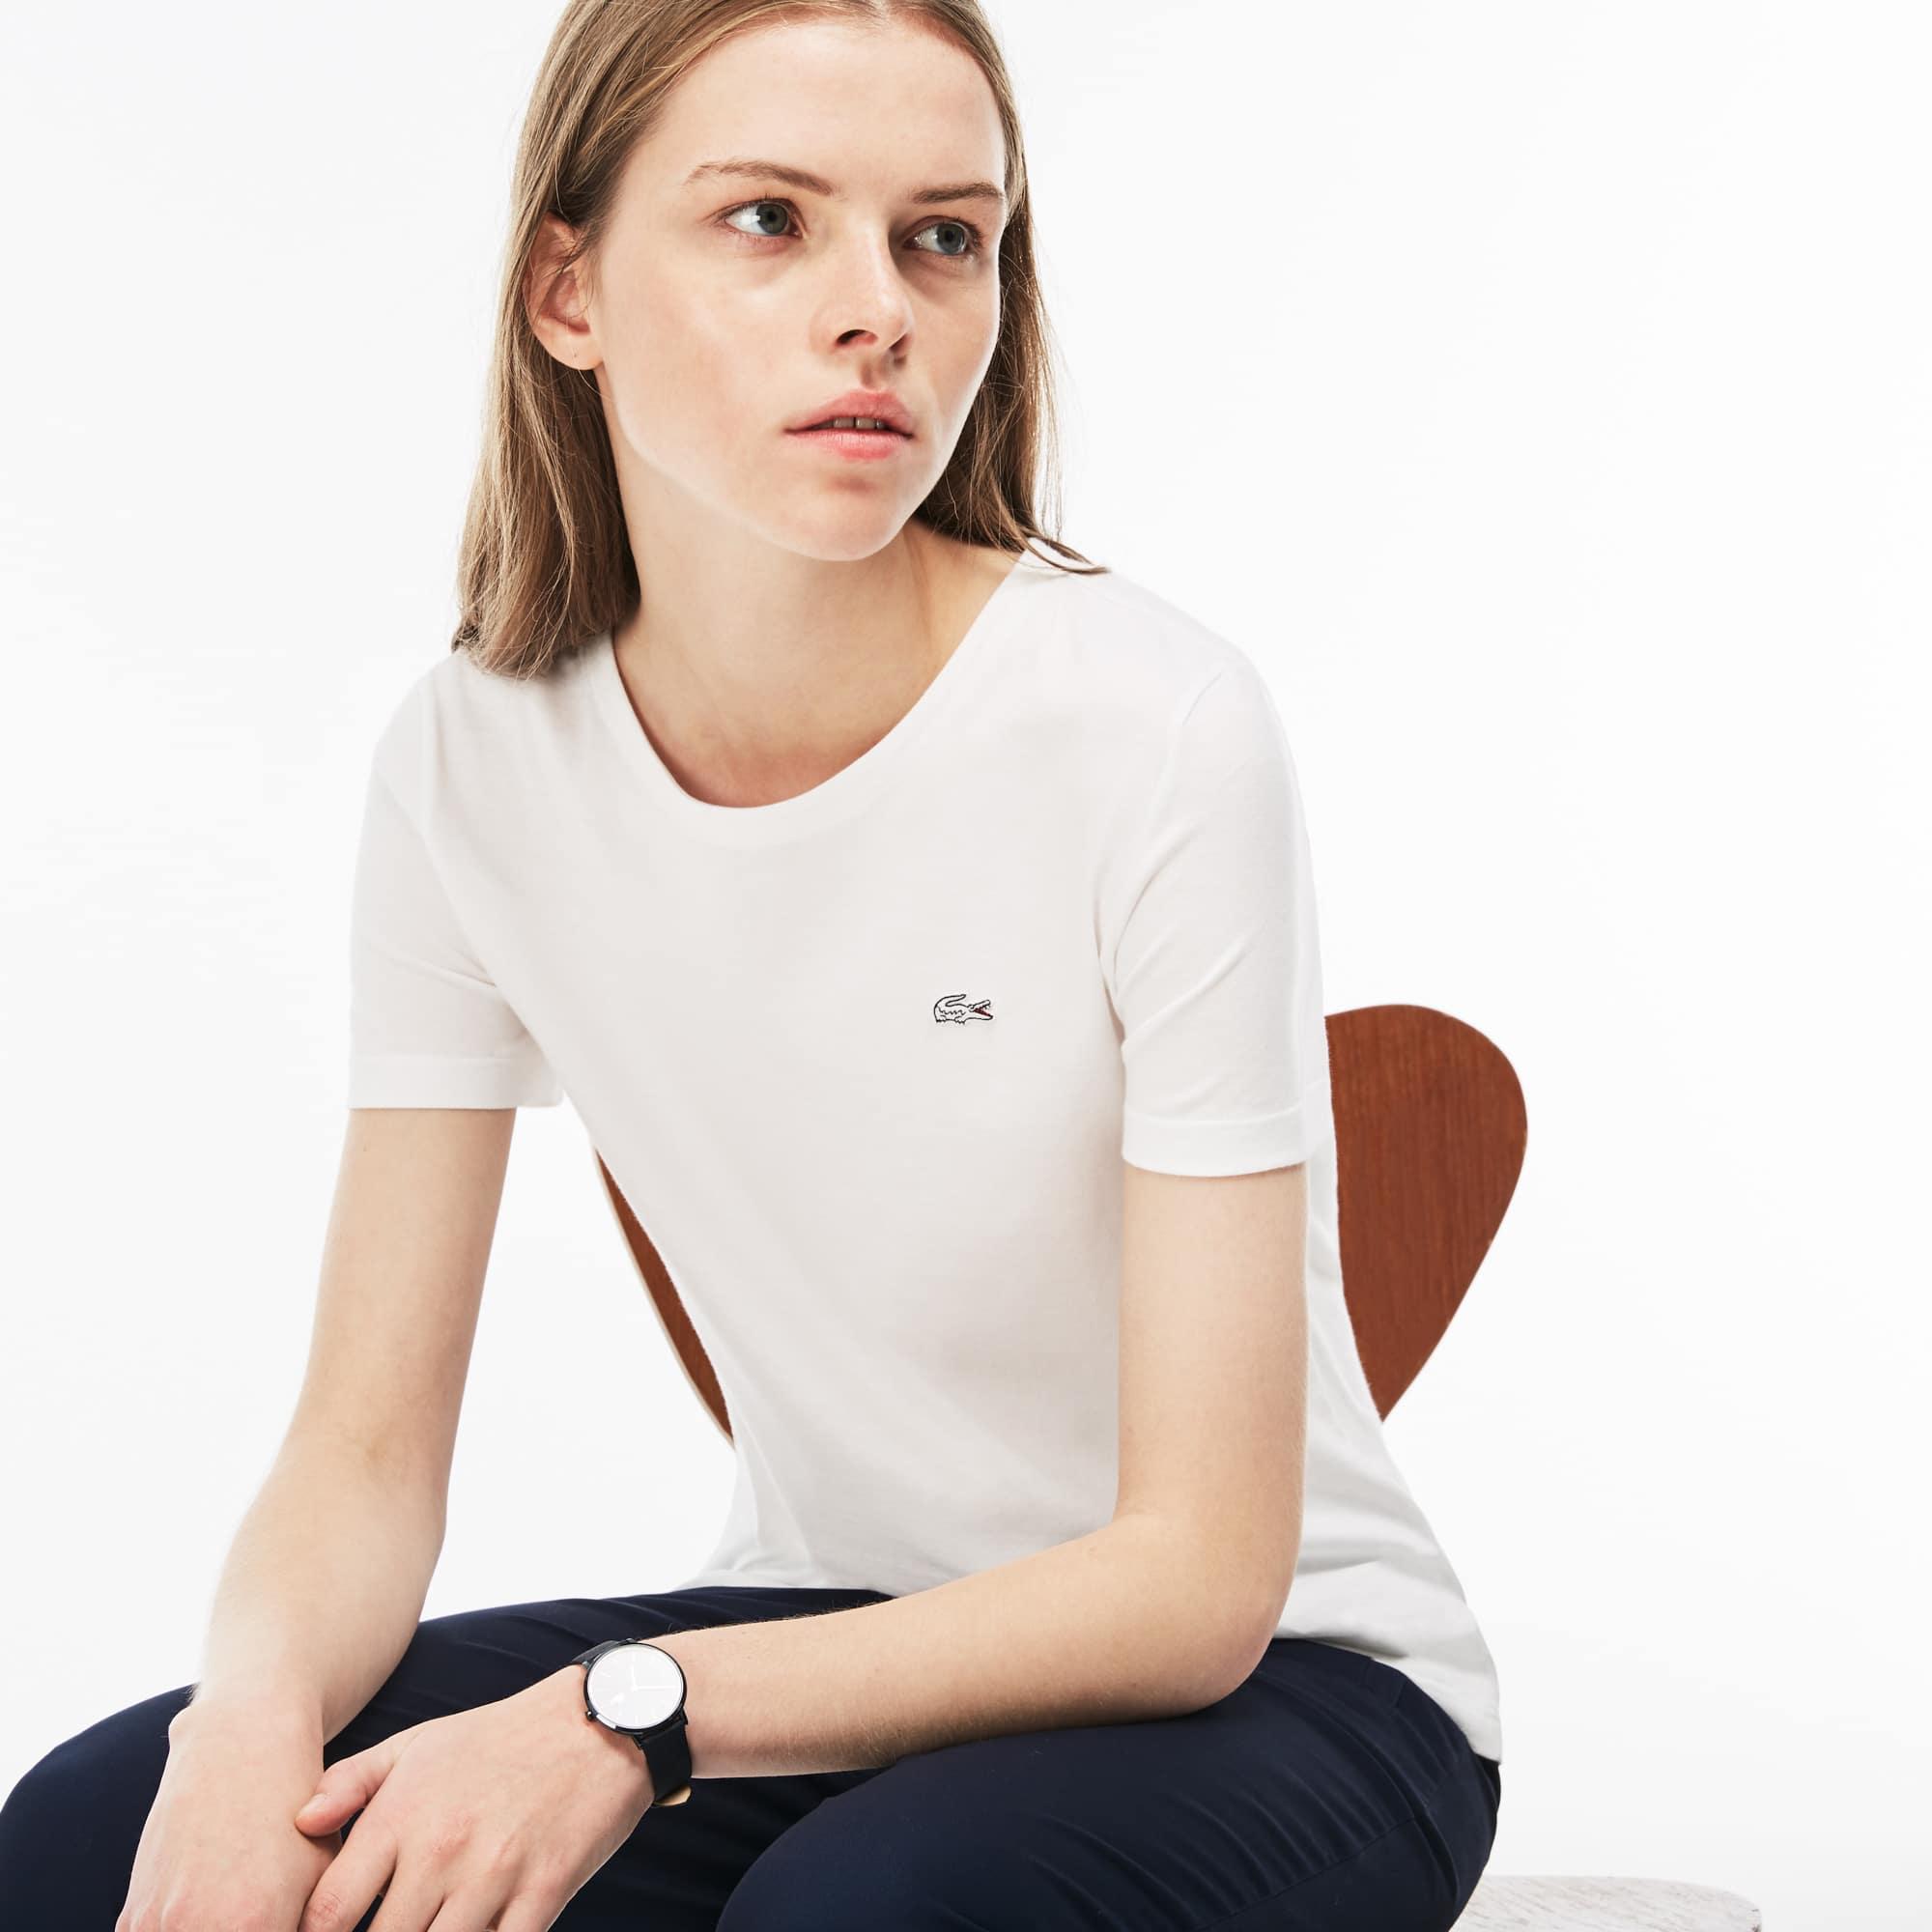 Women's Crew Neck Flowing Cotton Jersey T-shirt | LACOSTE